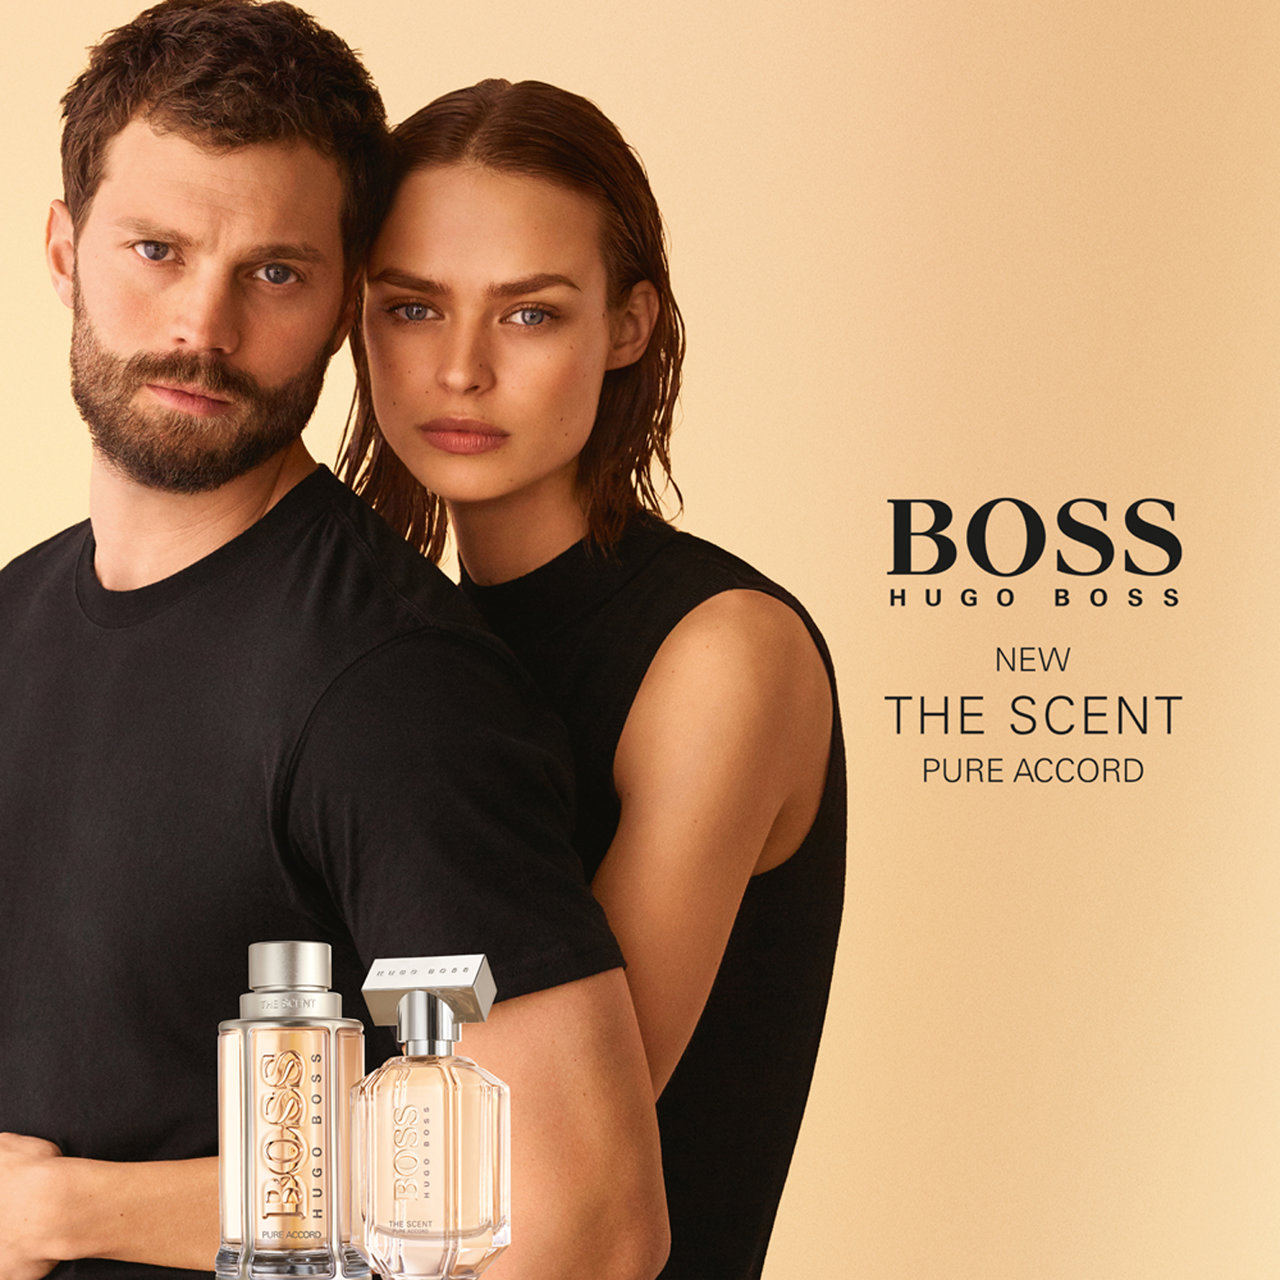 /hugo-boss/boss/boss-the-scent